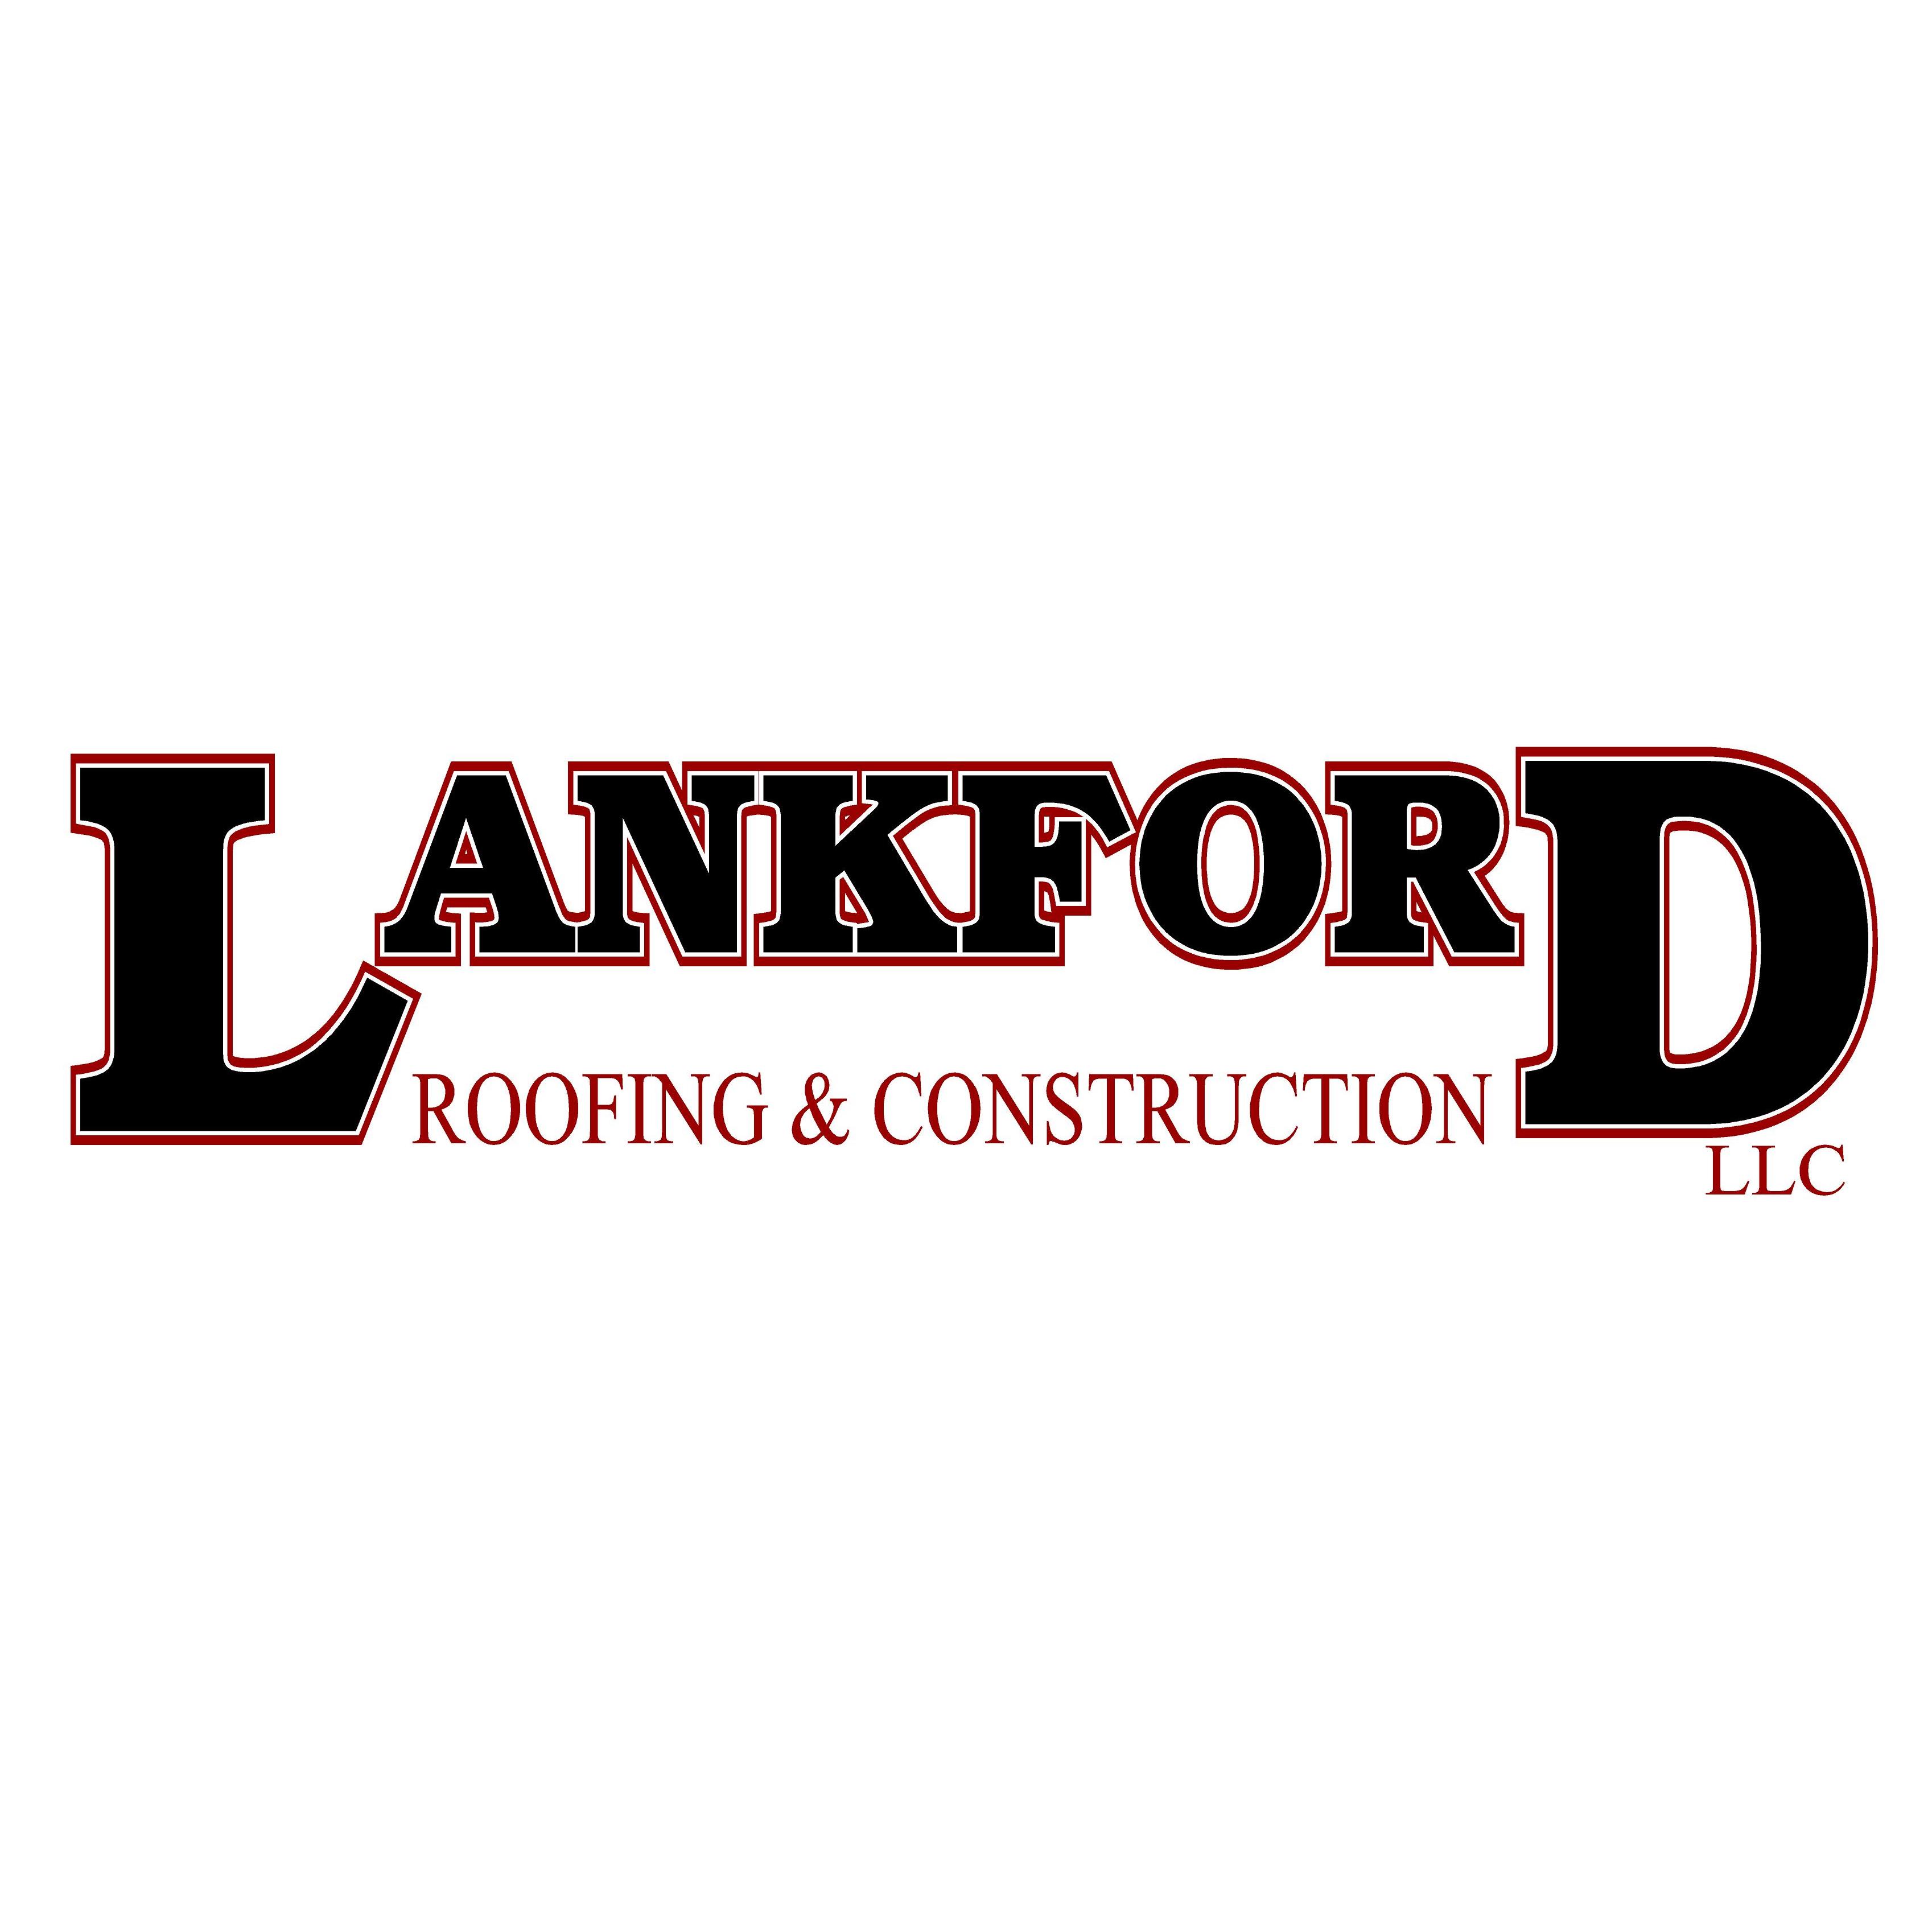 Lankford Roofing & Construction LLC Logo